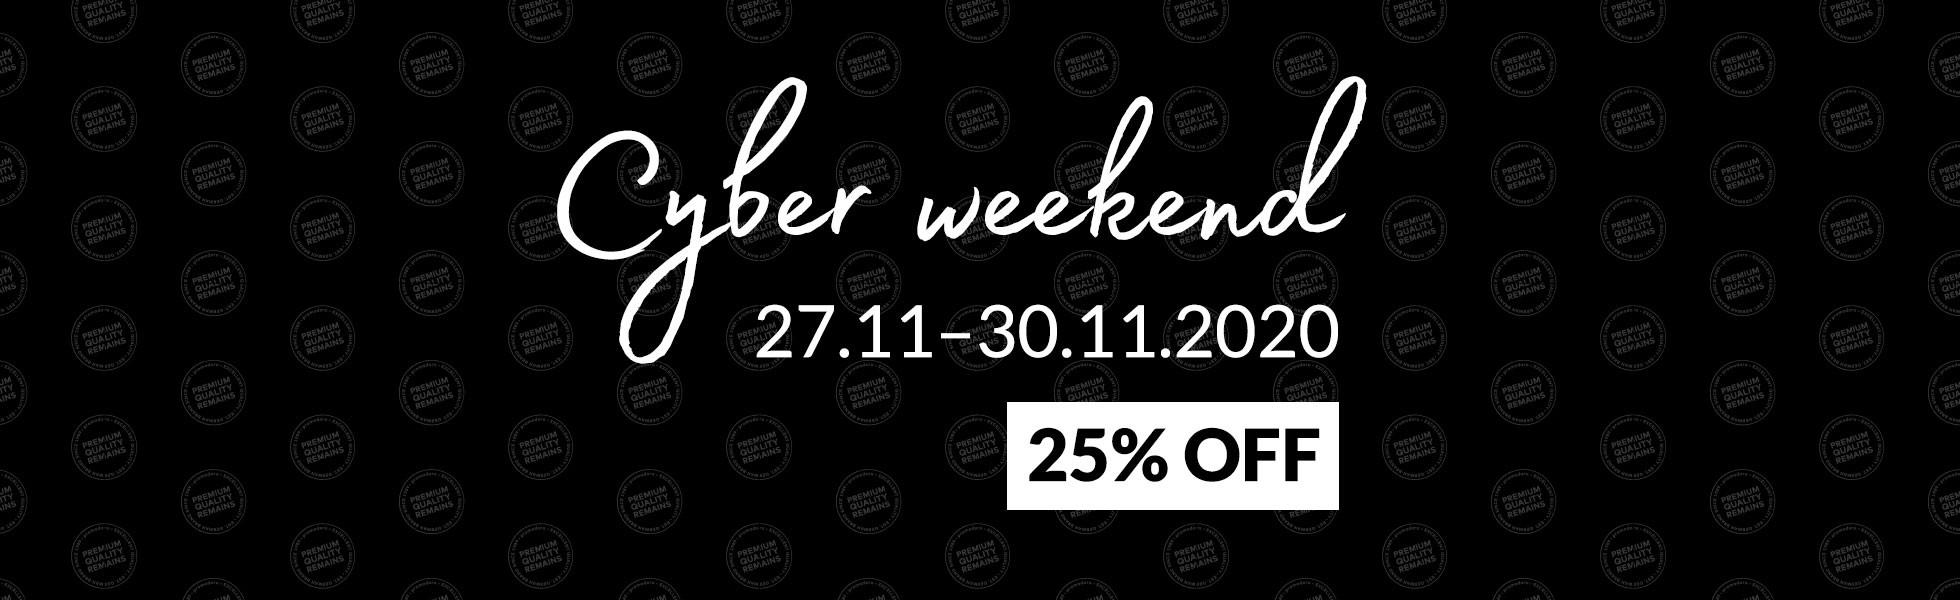 Cyberweekend - 25% discount